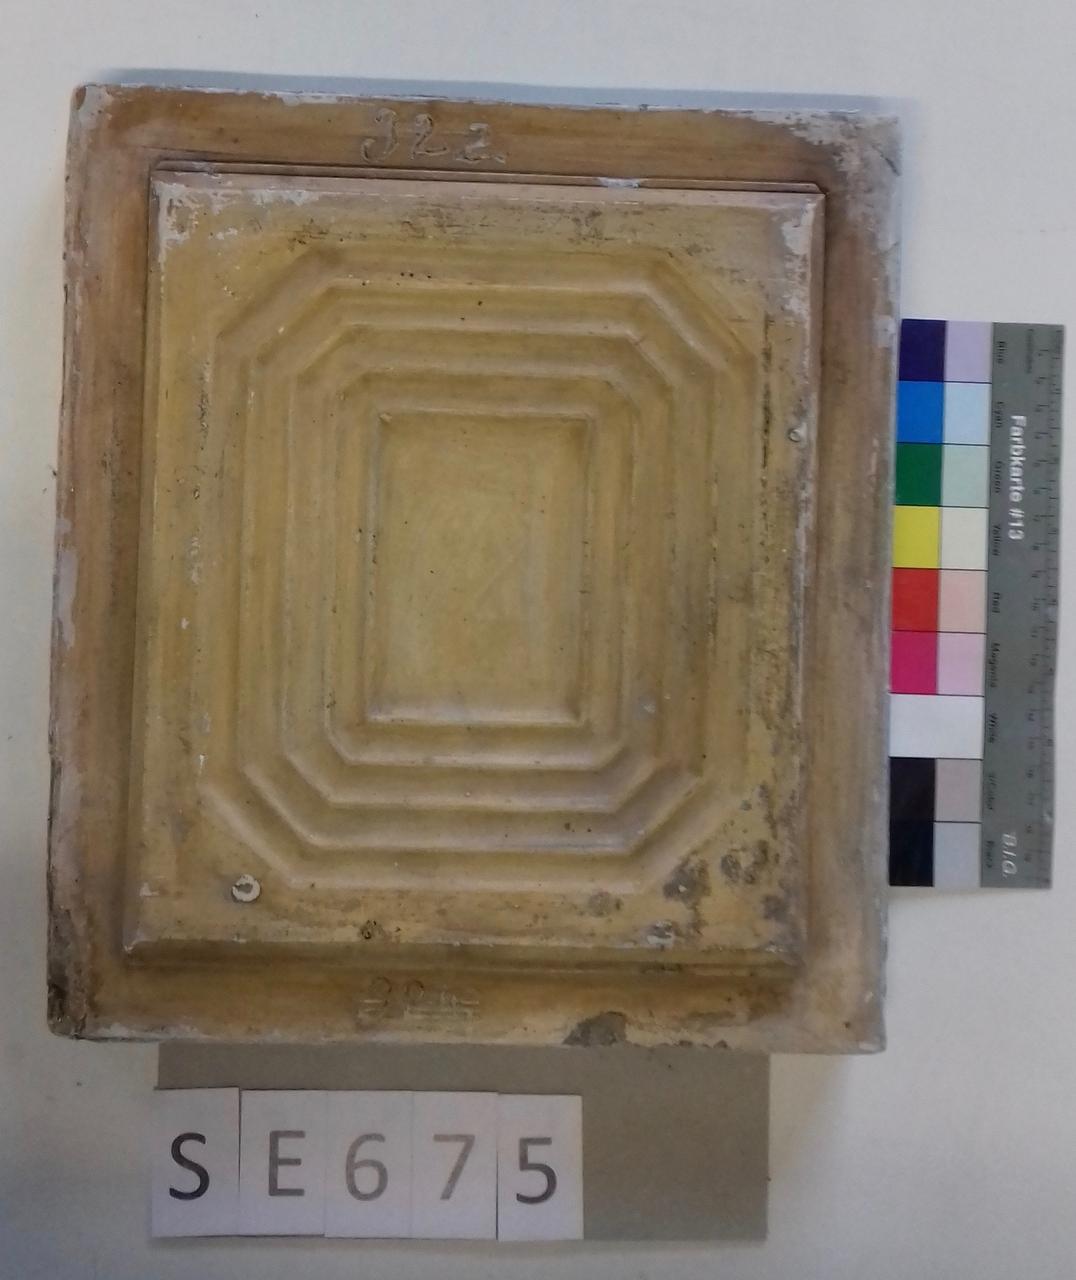 Mutterform ledige Kachel mit quadratischem Muster